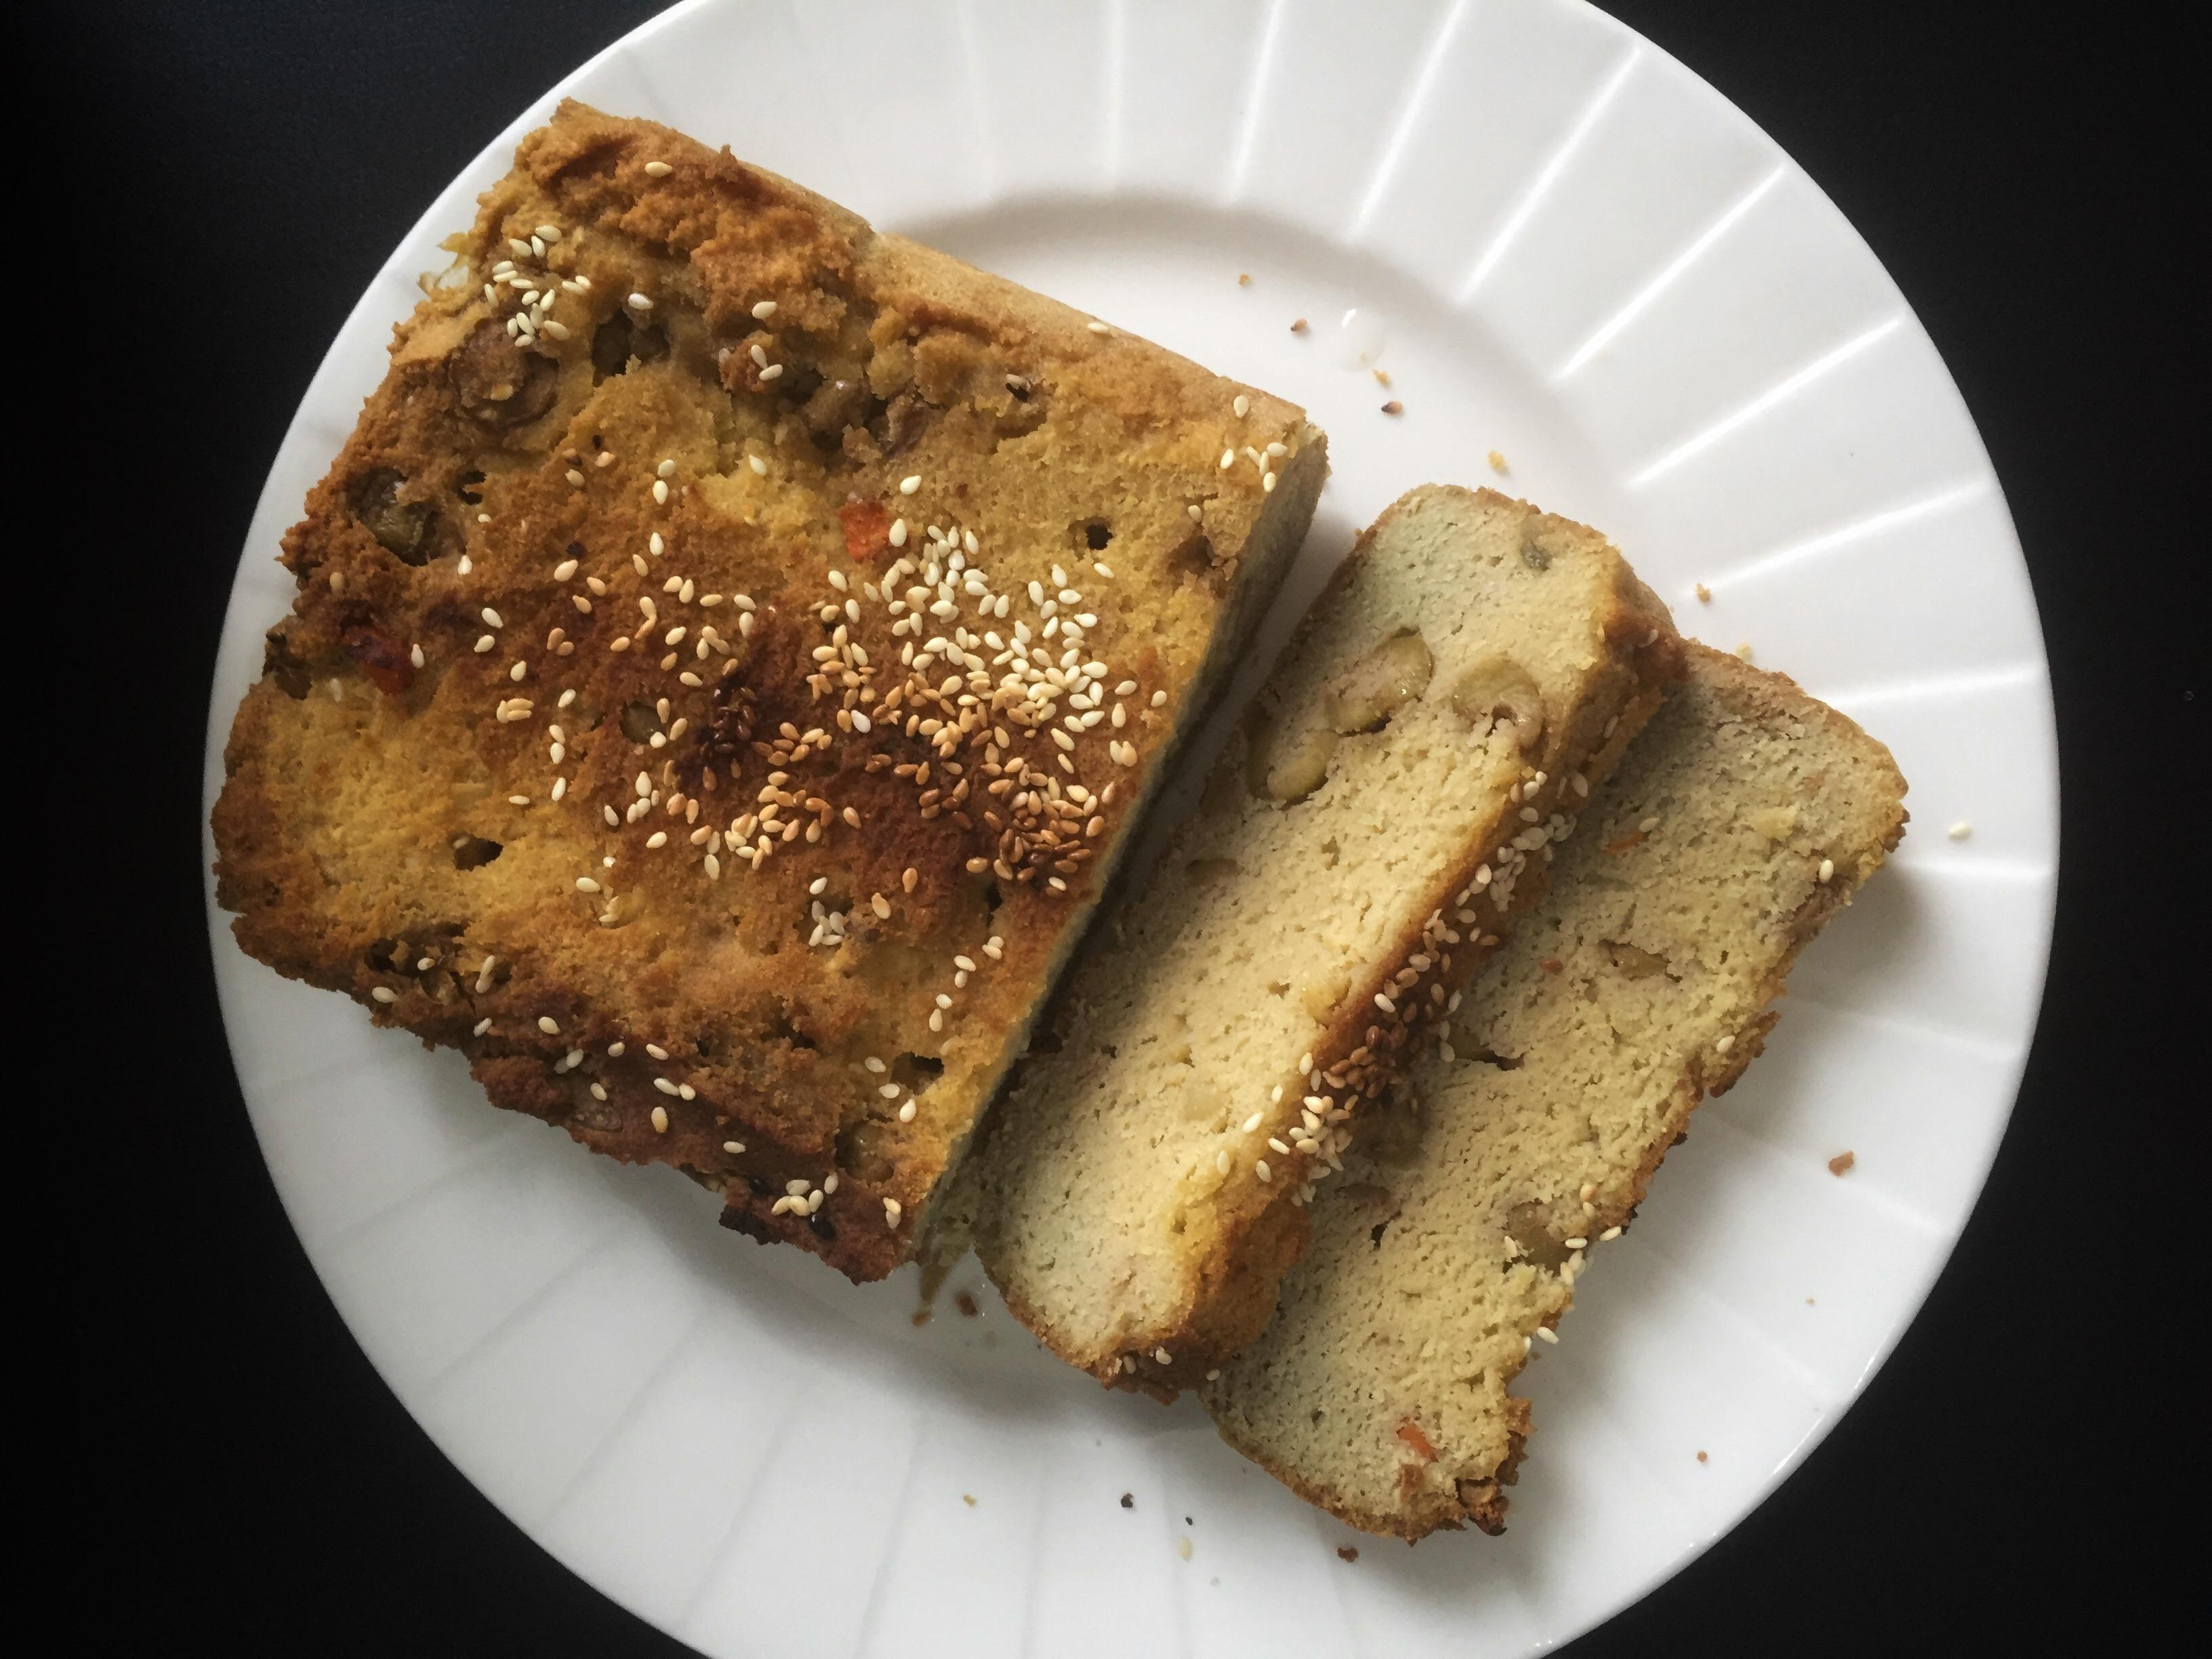 Keto Low Carbs Paleo Homemade Bread